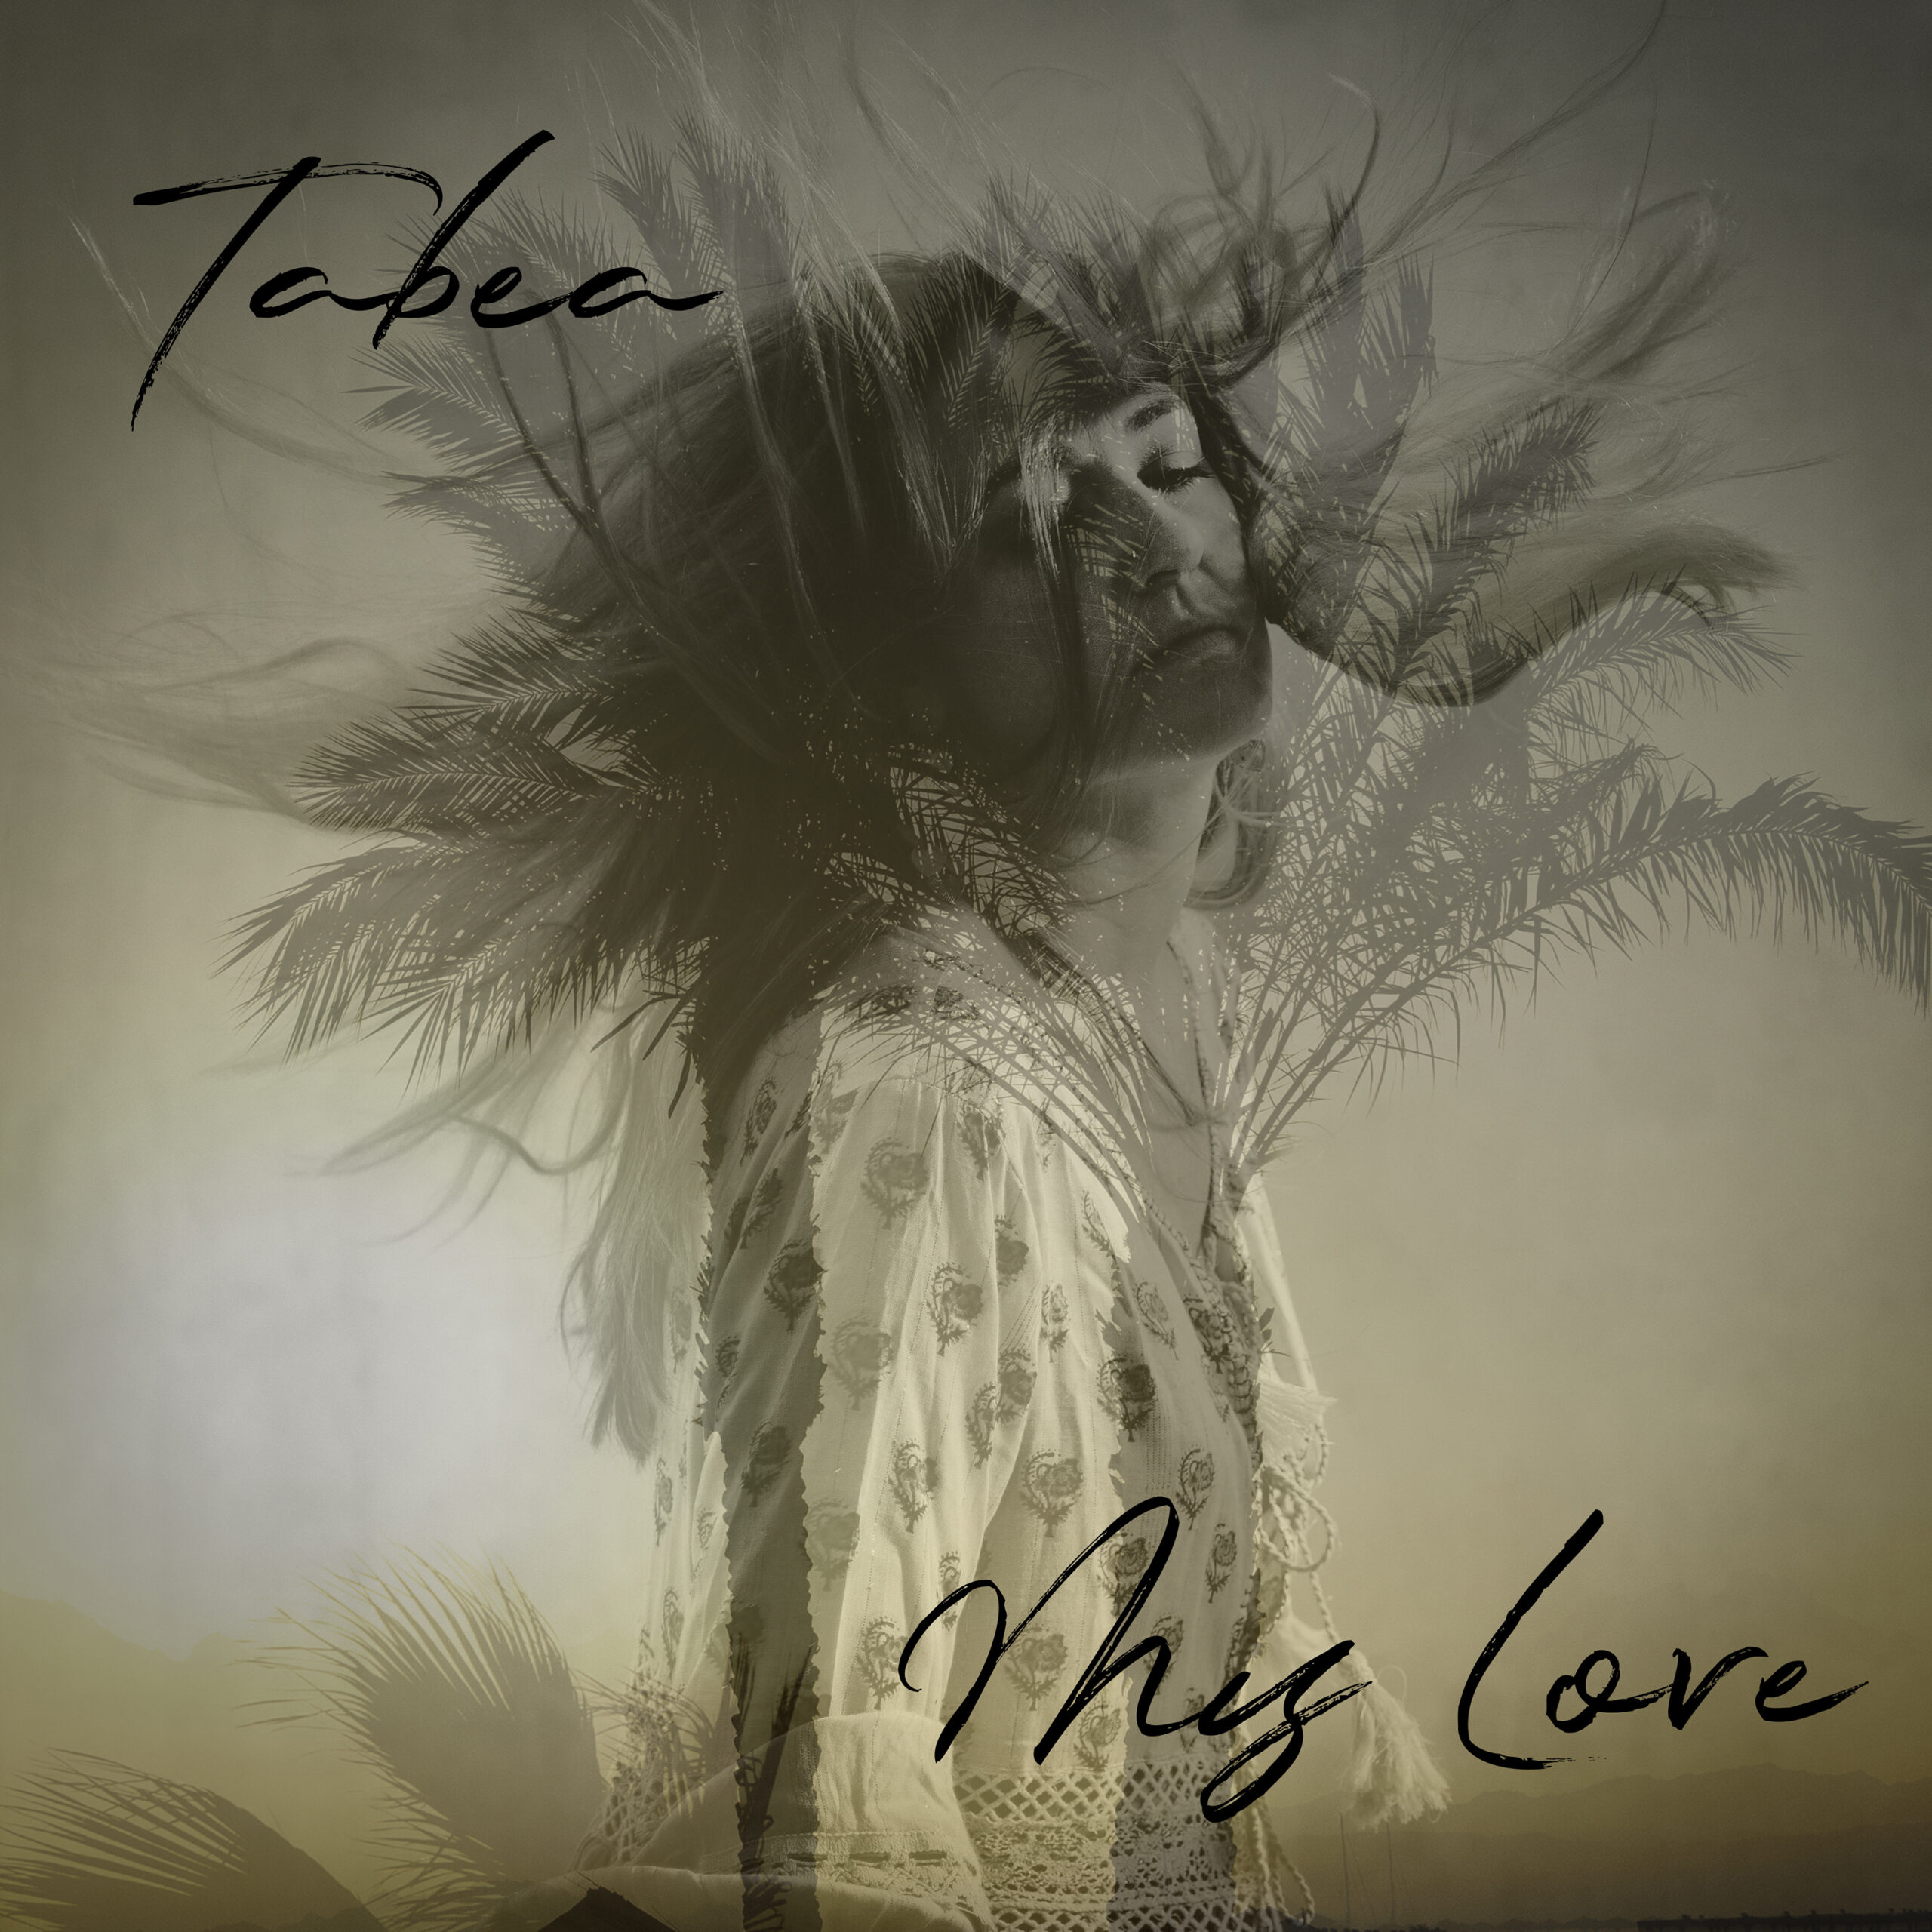 Tabea - My Love